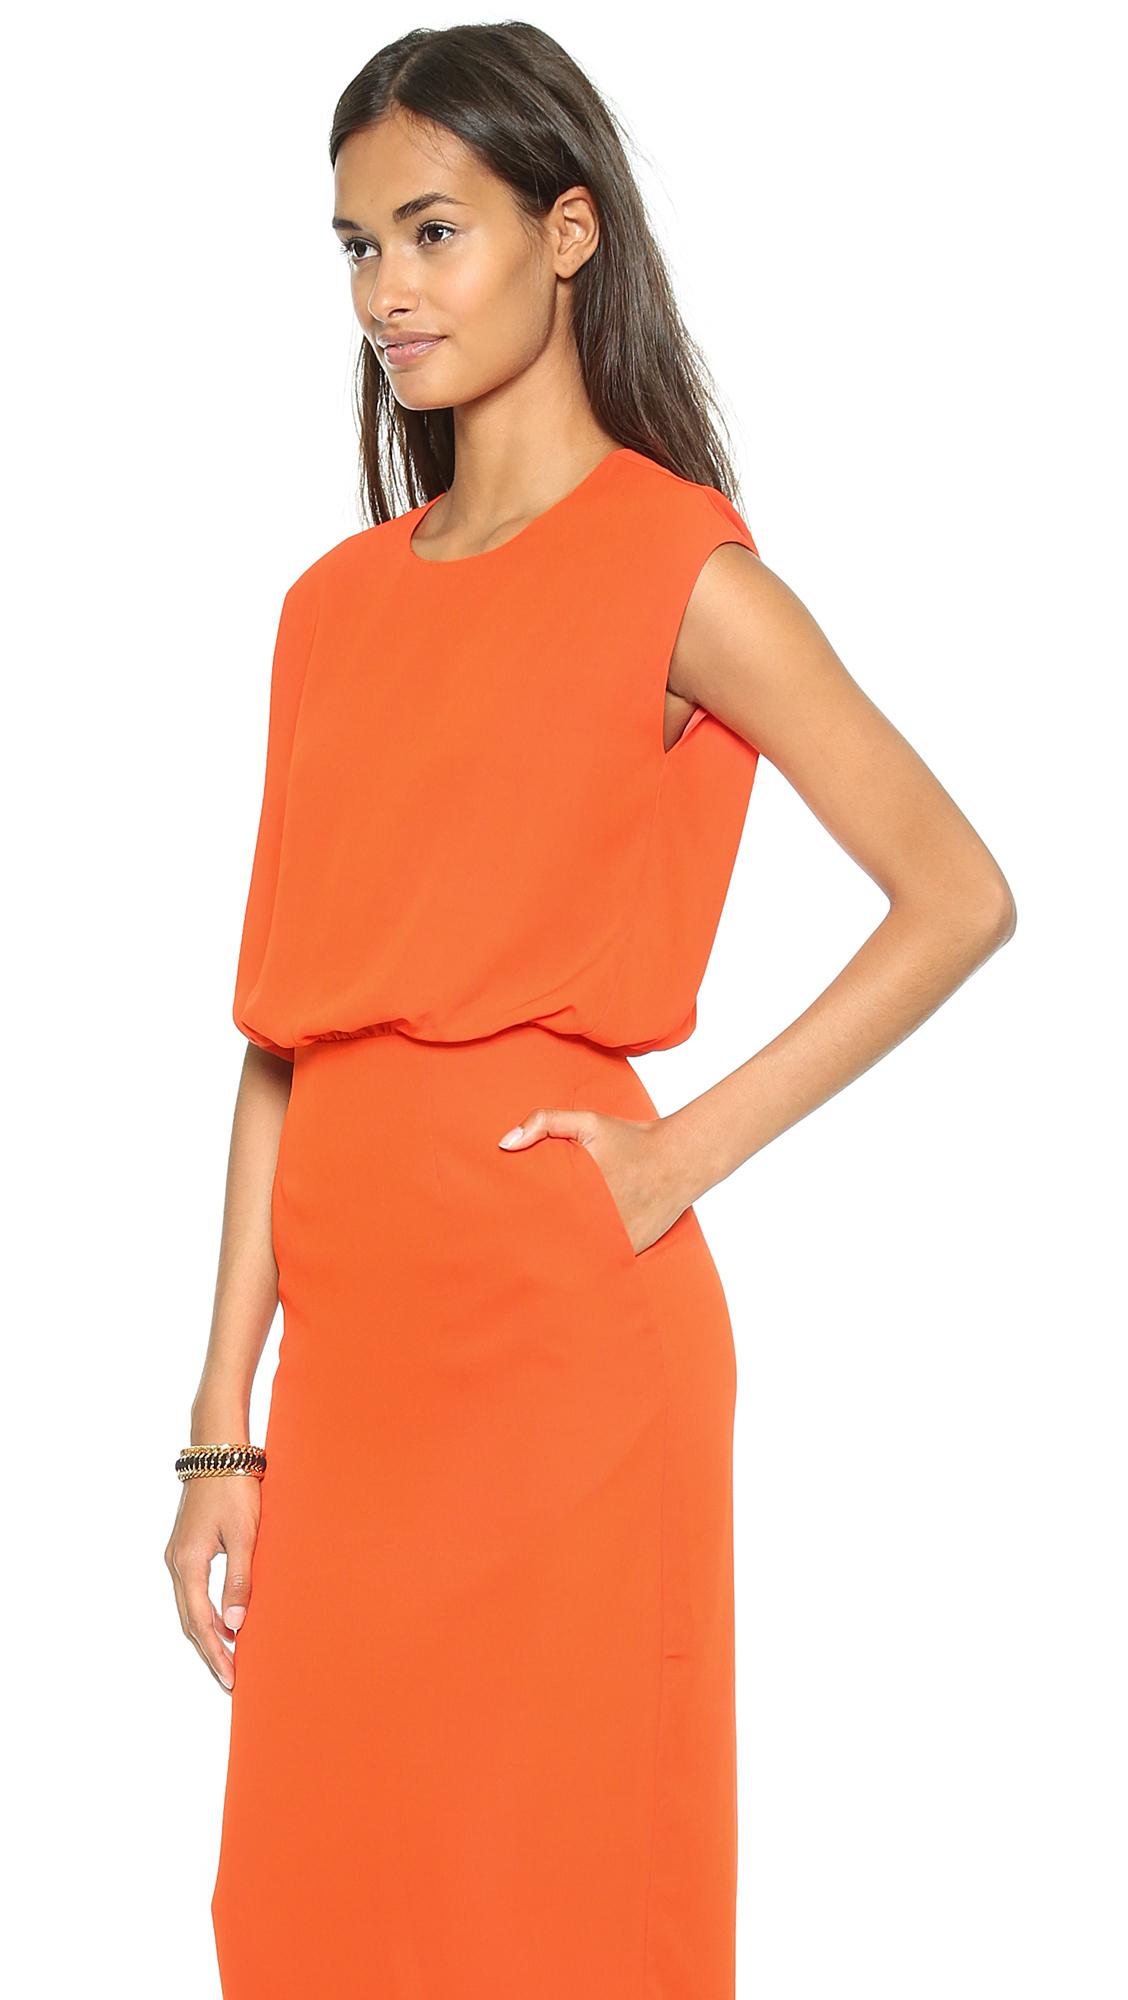 Blaque Label Sleeveless Dress Black In Orange | Lyst